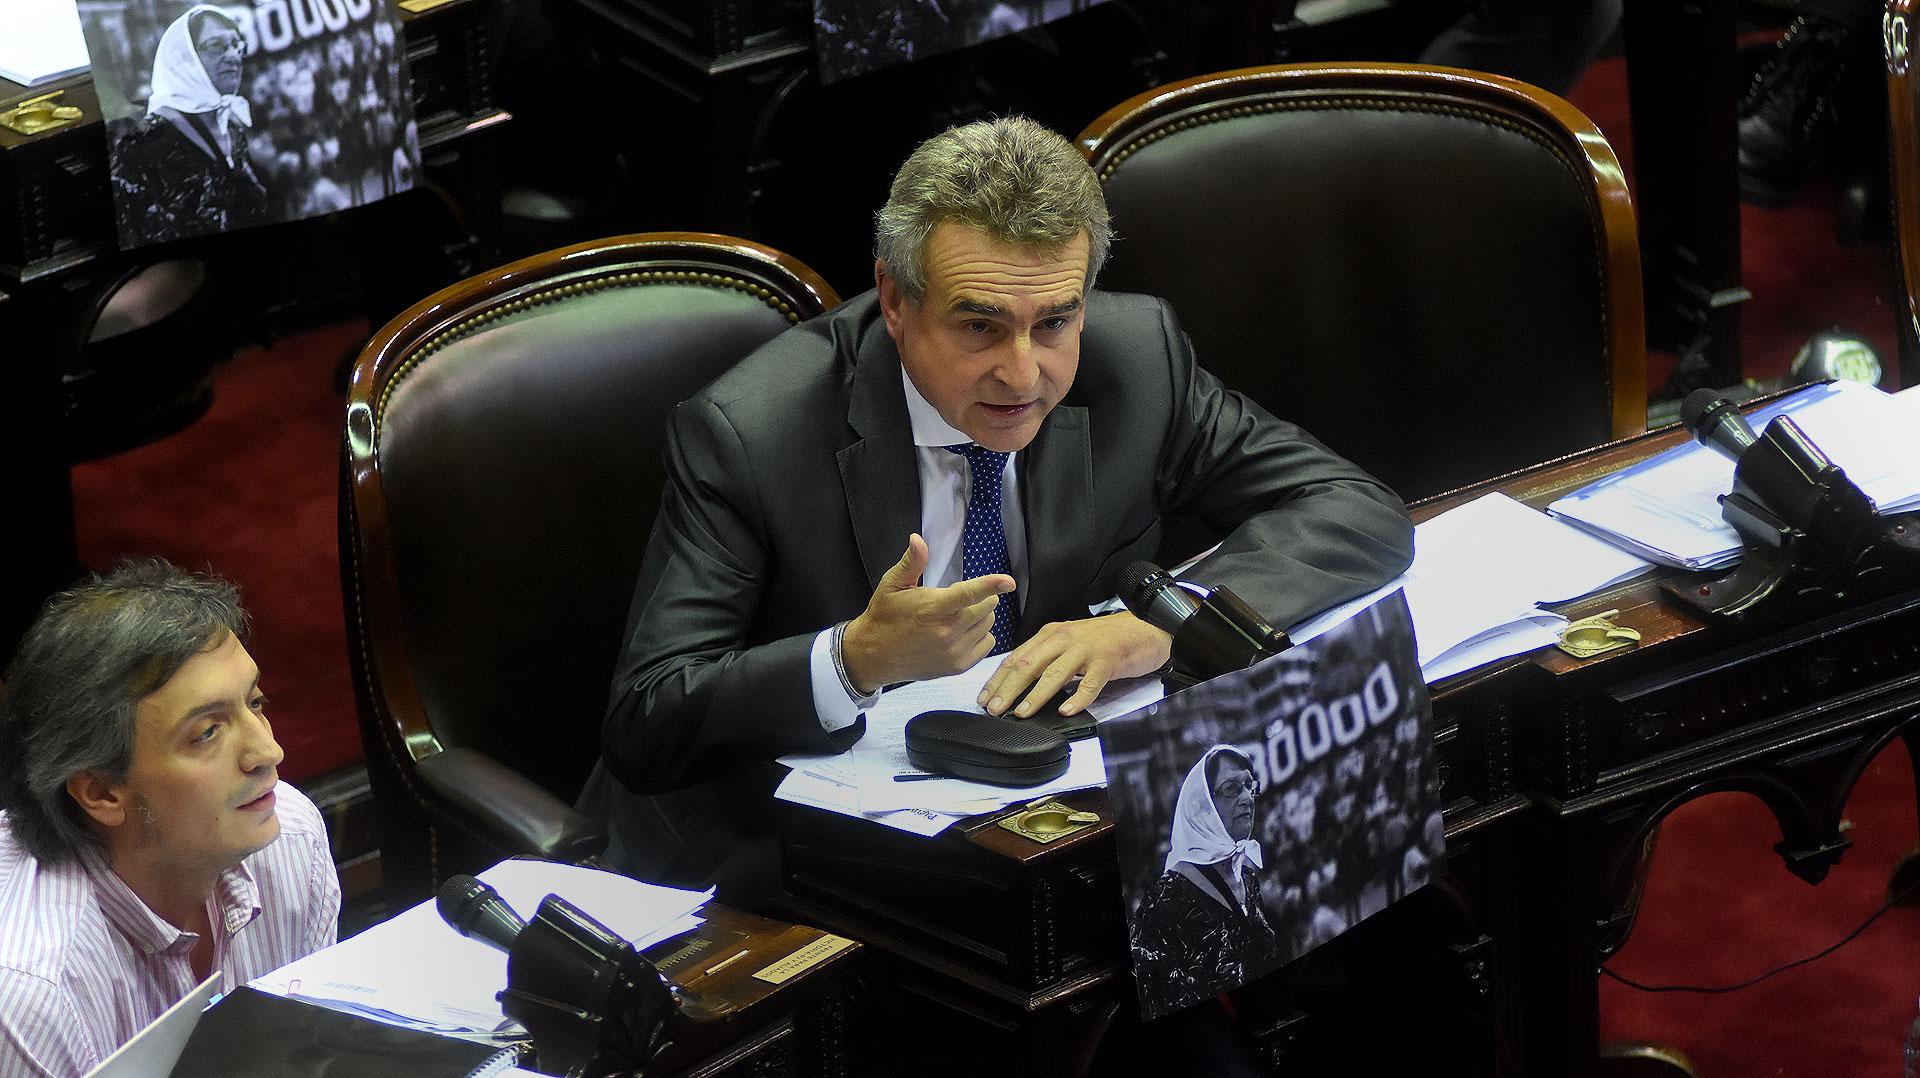 El diputado kirchnerista Agustín Rossi